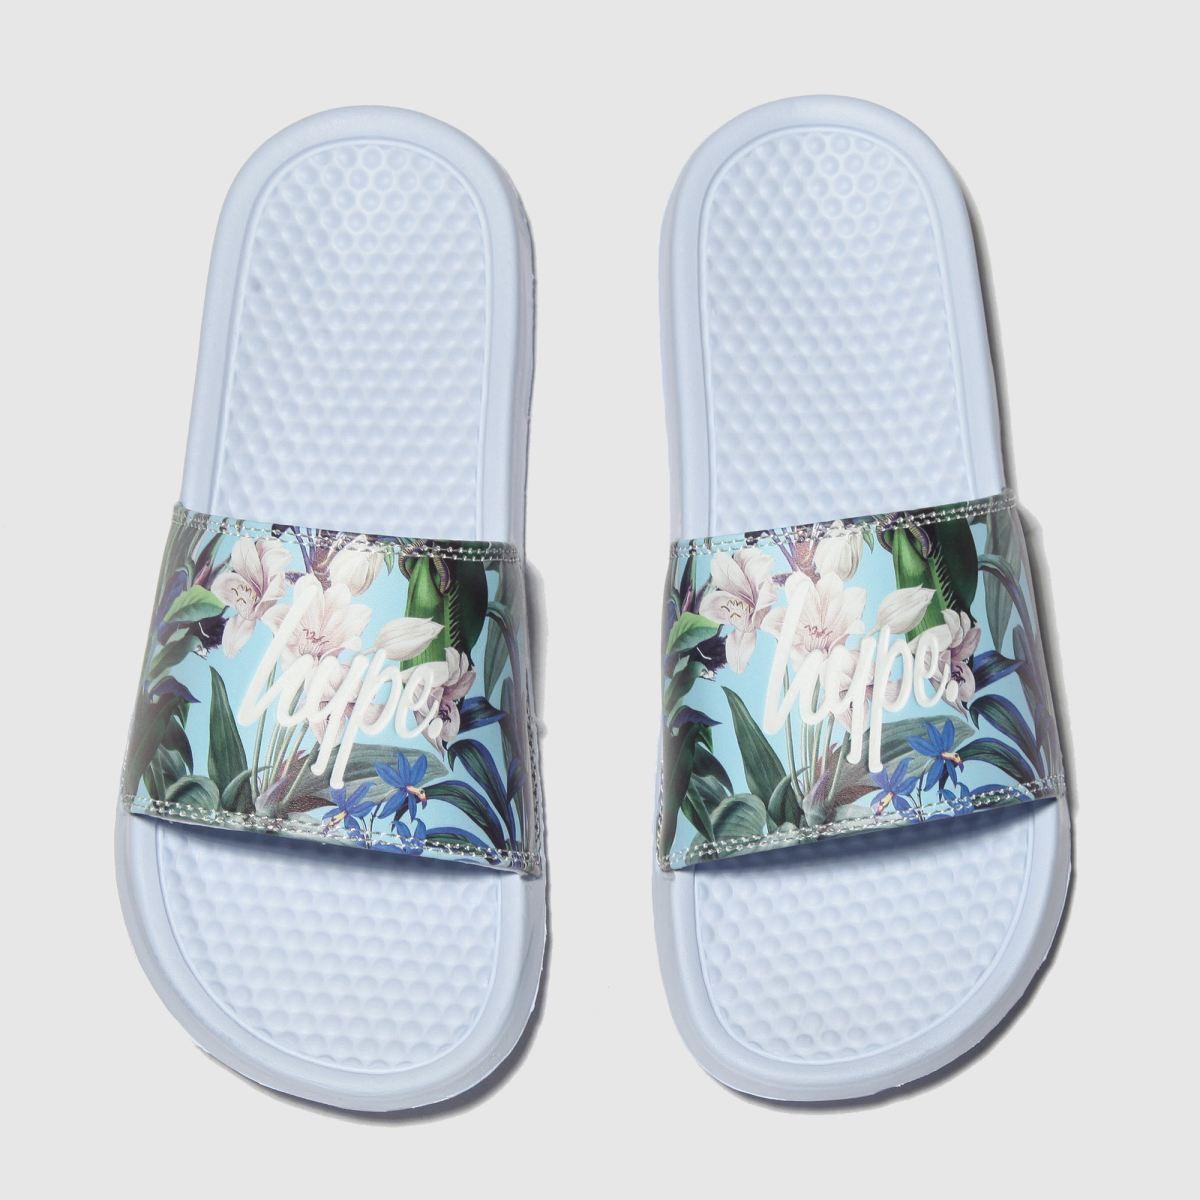 Hype Multi Pastel Floral Sliders Sandals Junior